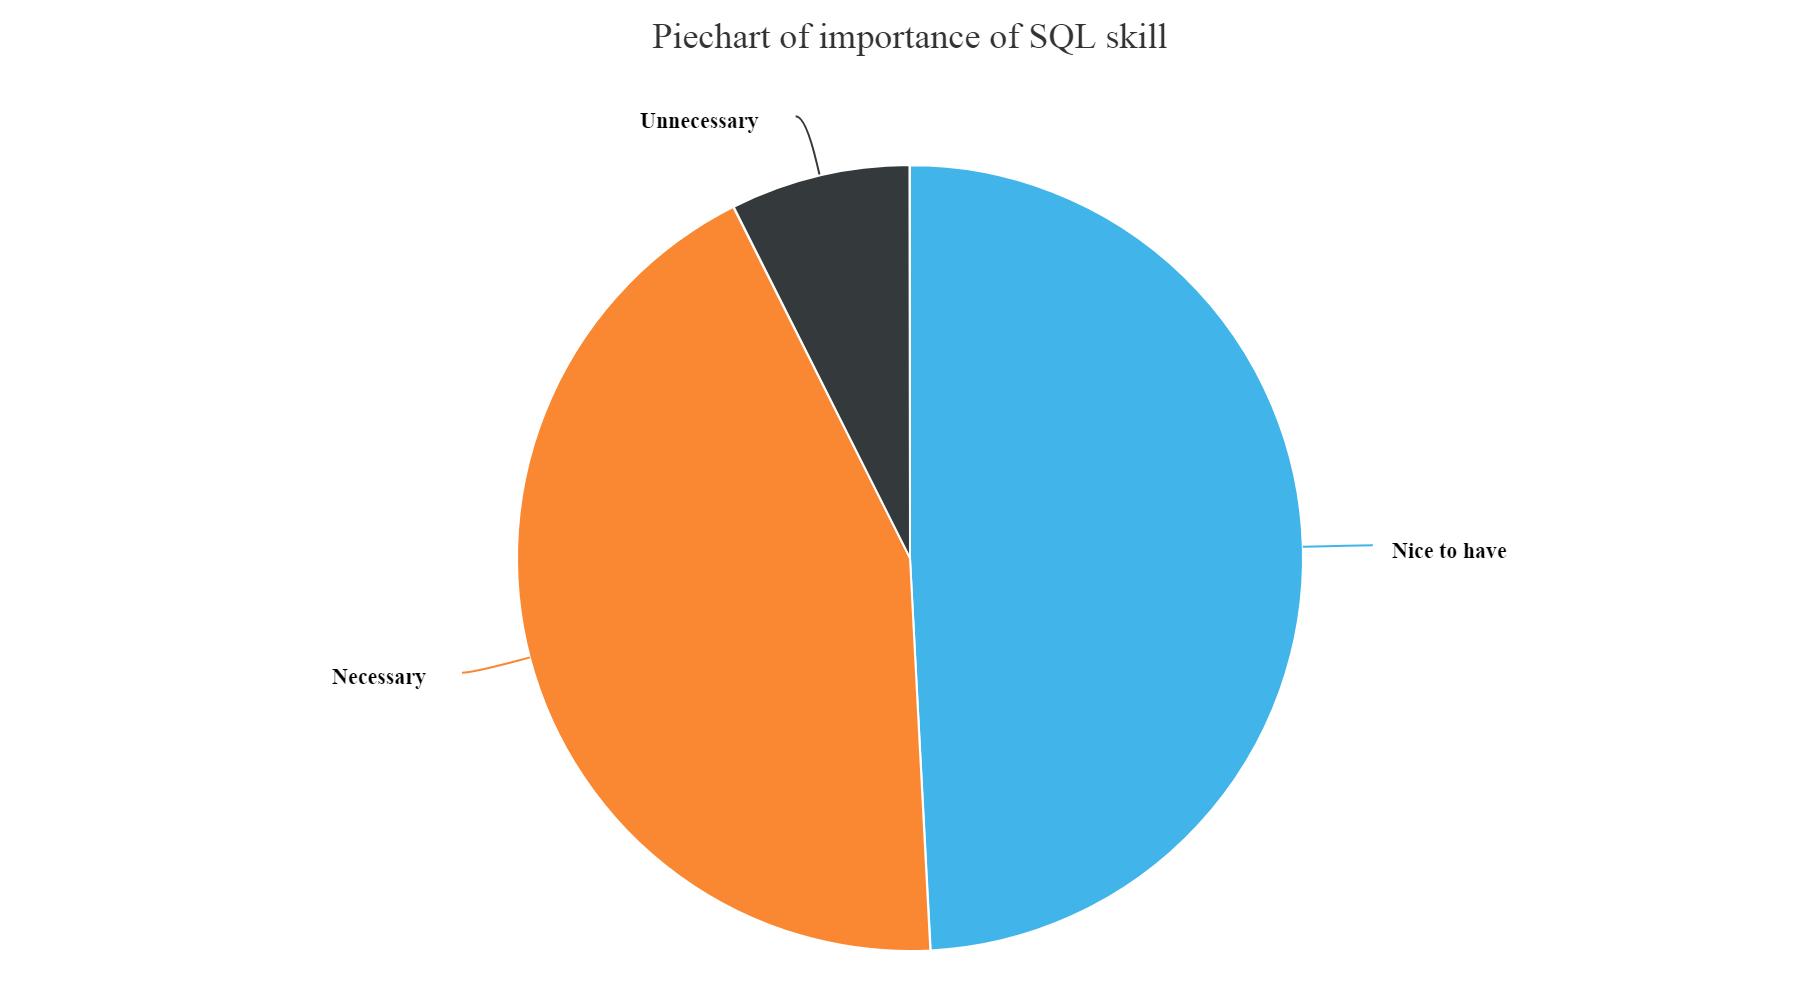 Kaggle data science survey data analysis using highcharter gives this plot nvjuhfo Gallery